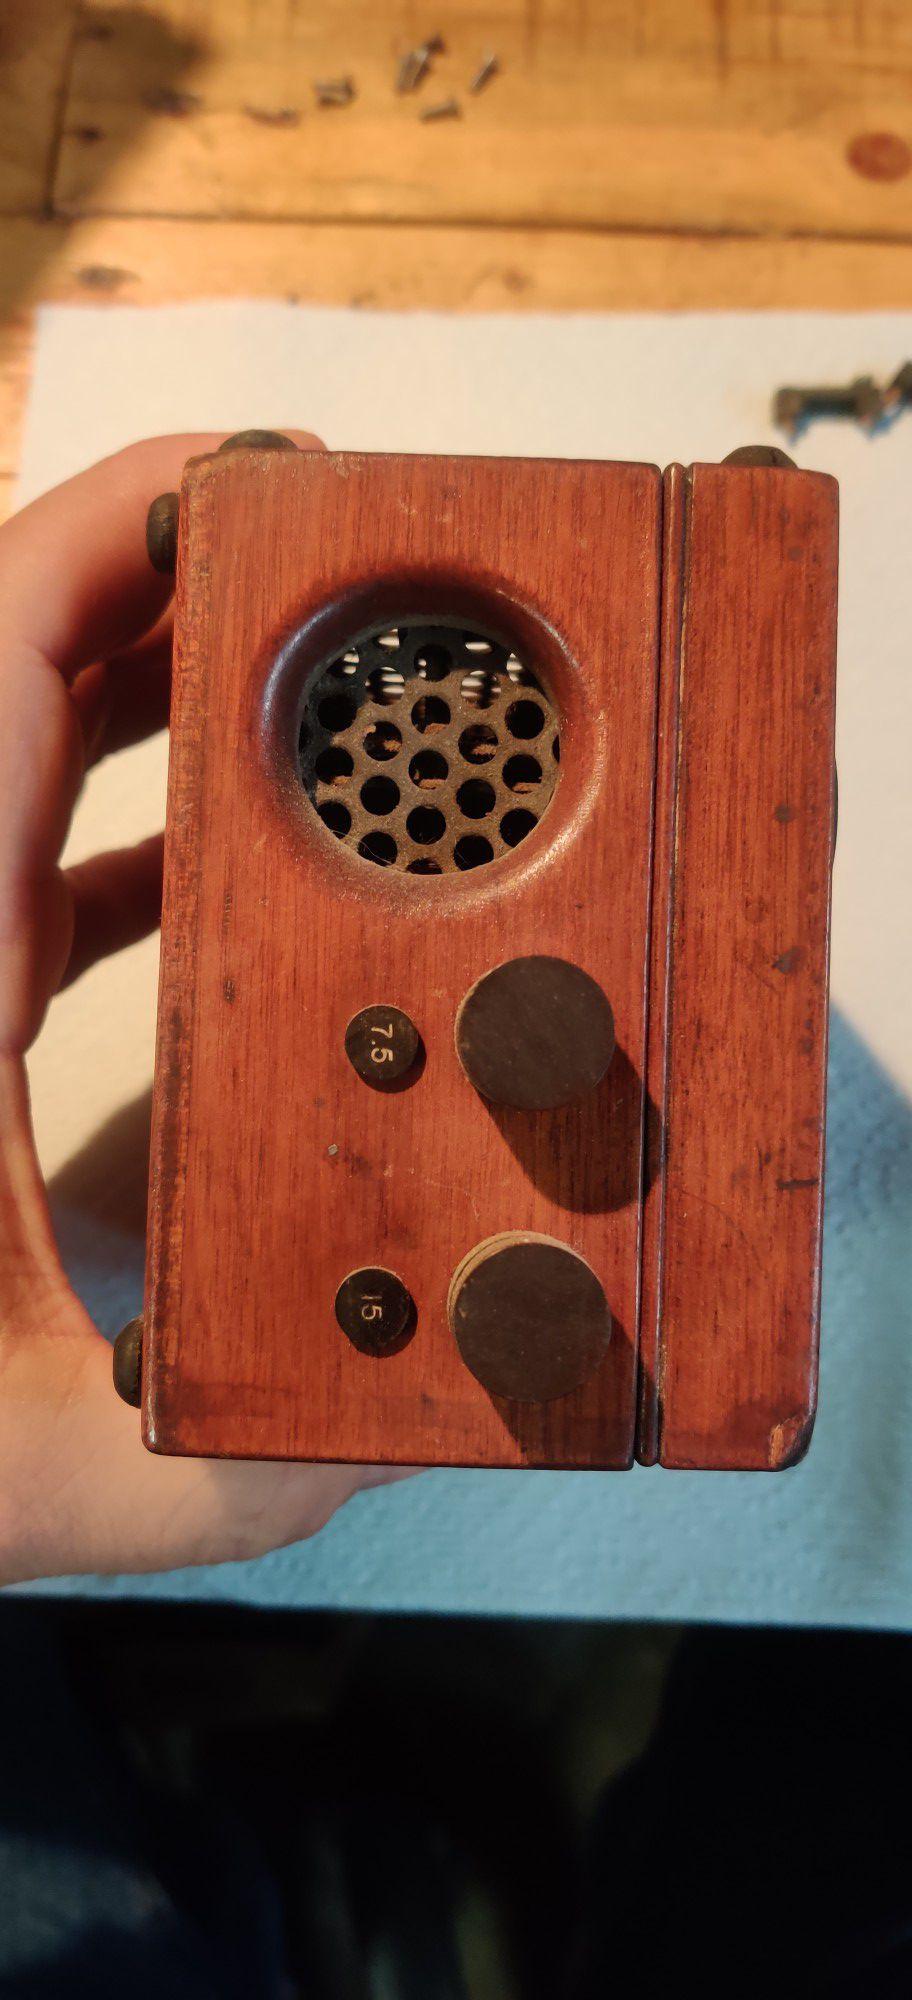 General Electric Voltmeter